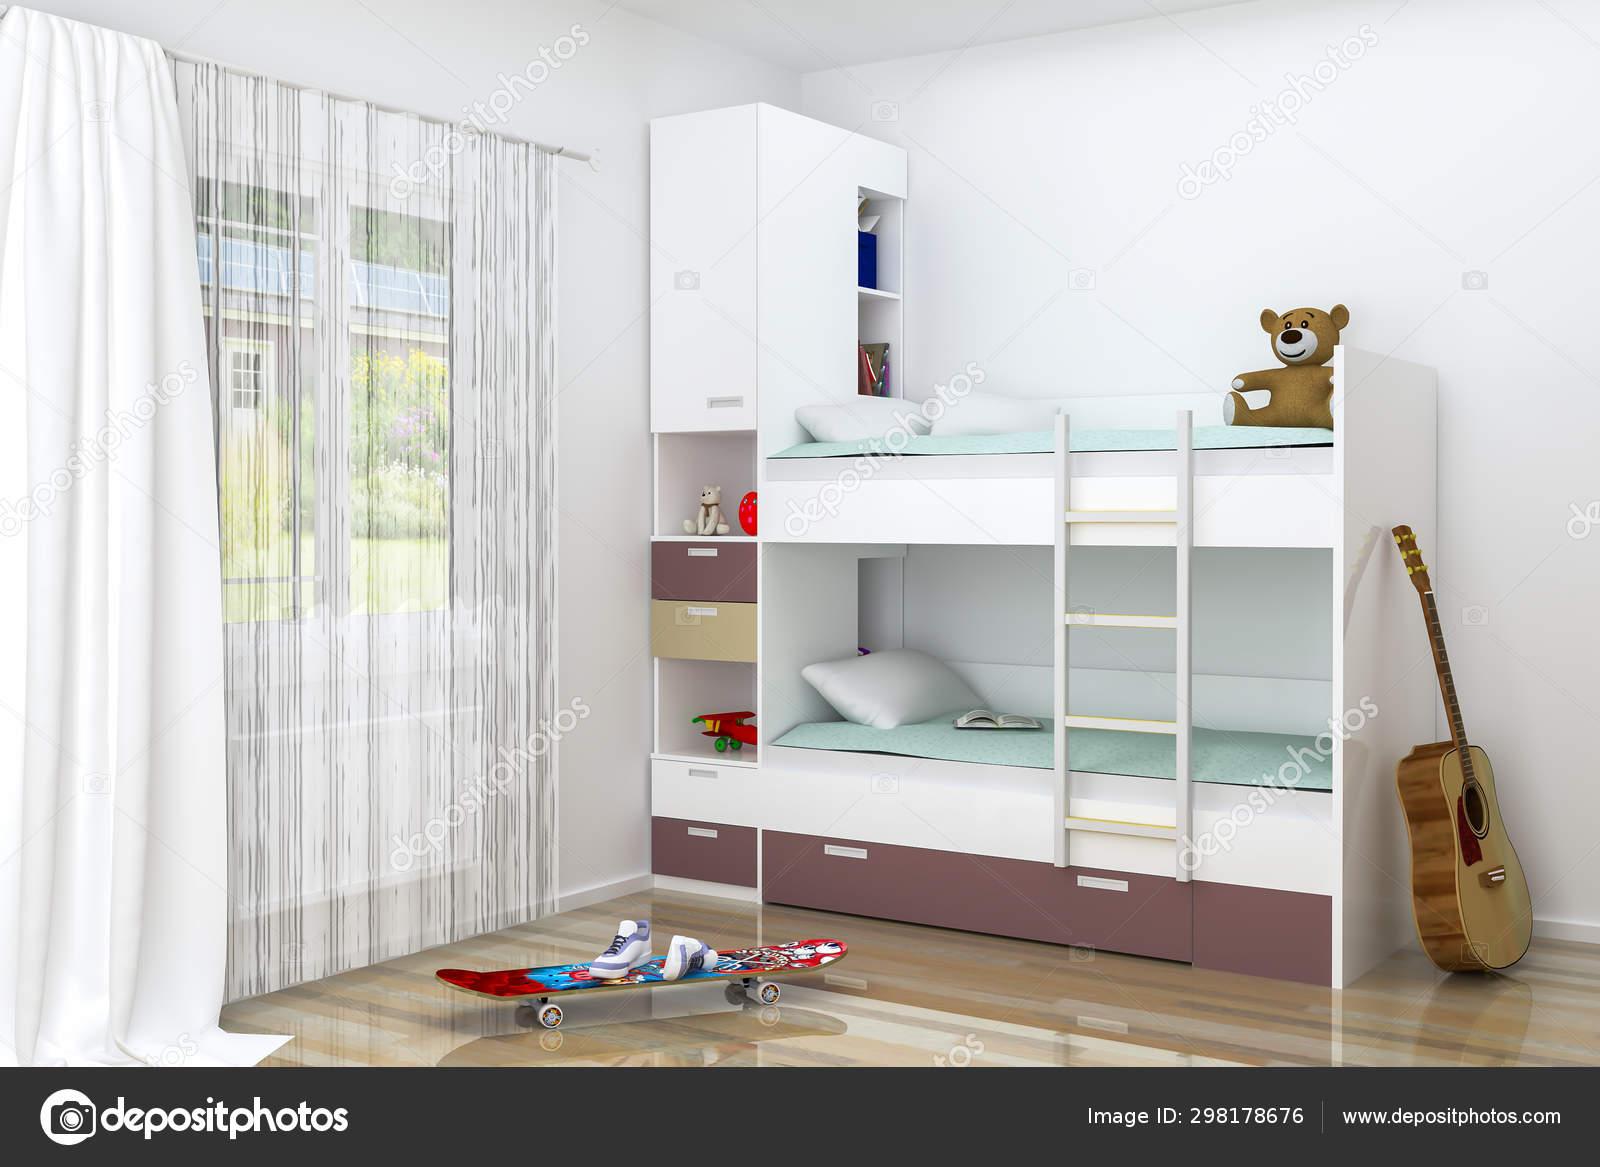 Realistic Rendering Modern Kids Bedroom Furniture Design Bunk Bed Decorations Stock Photo C Richard Salamander 298178676